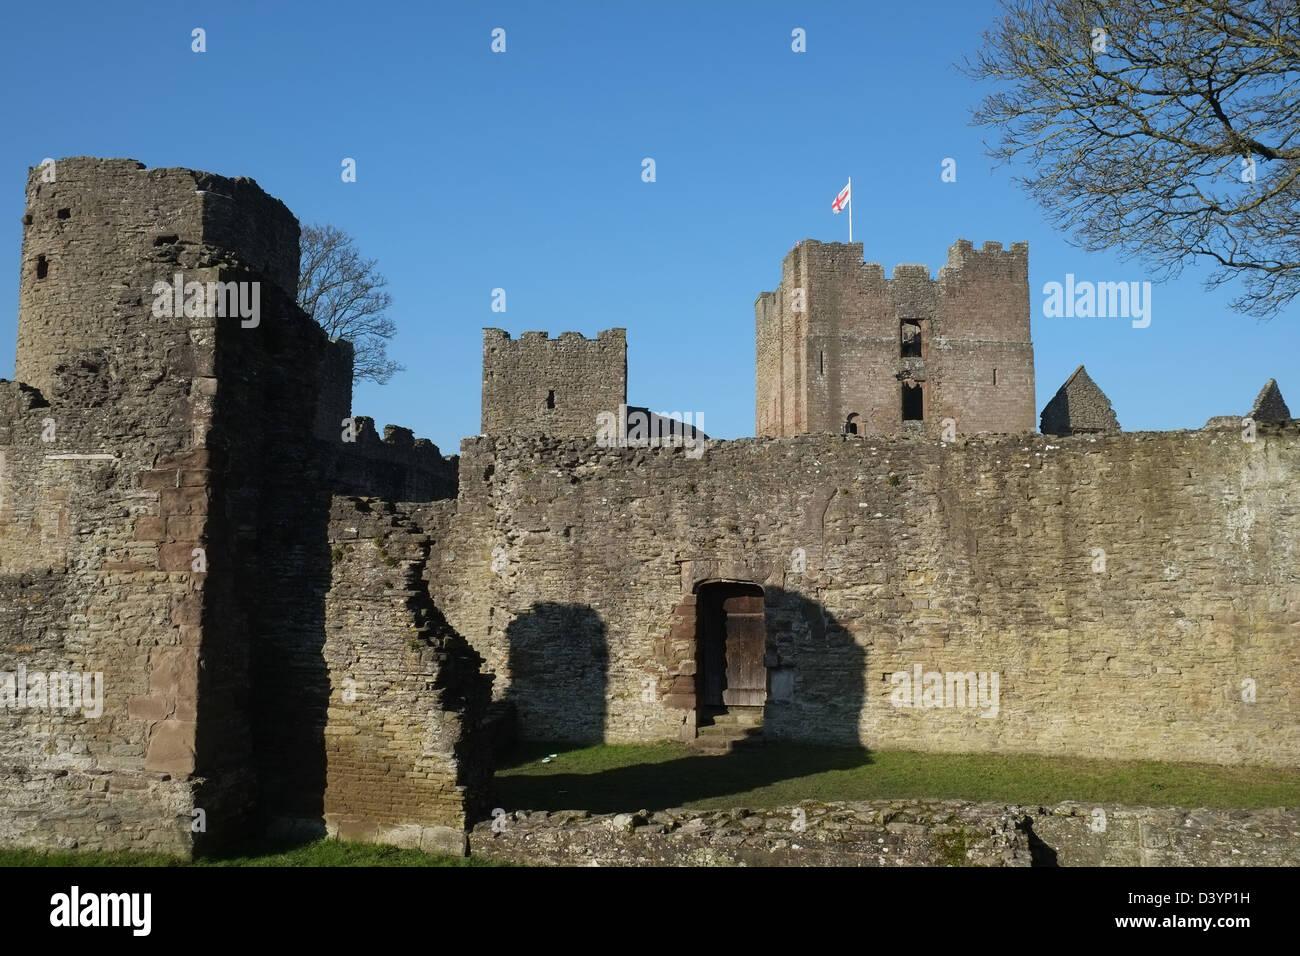 Ludlow Castle, Ludlow, Shropshire, England, Britain - Stock Image